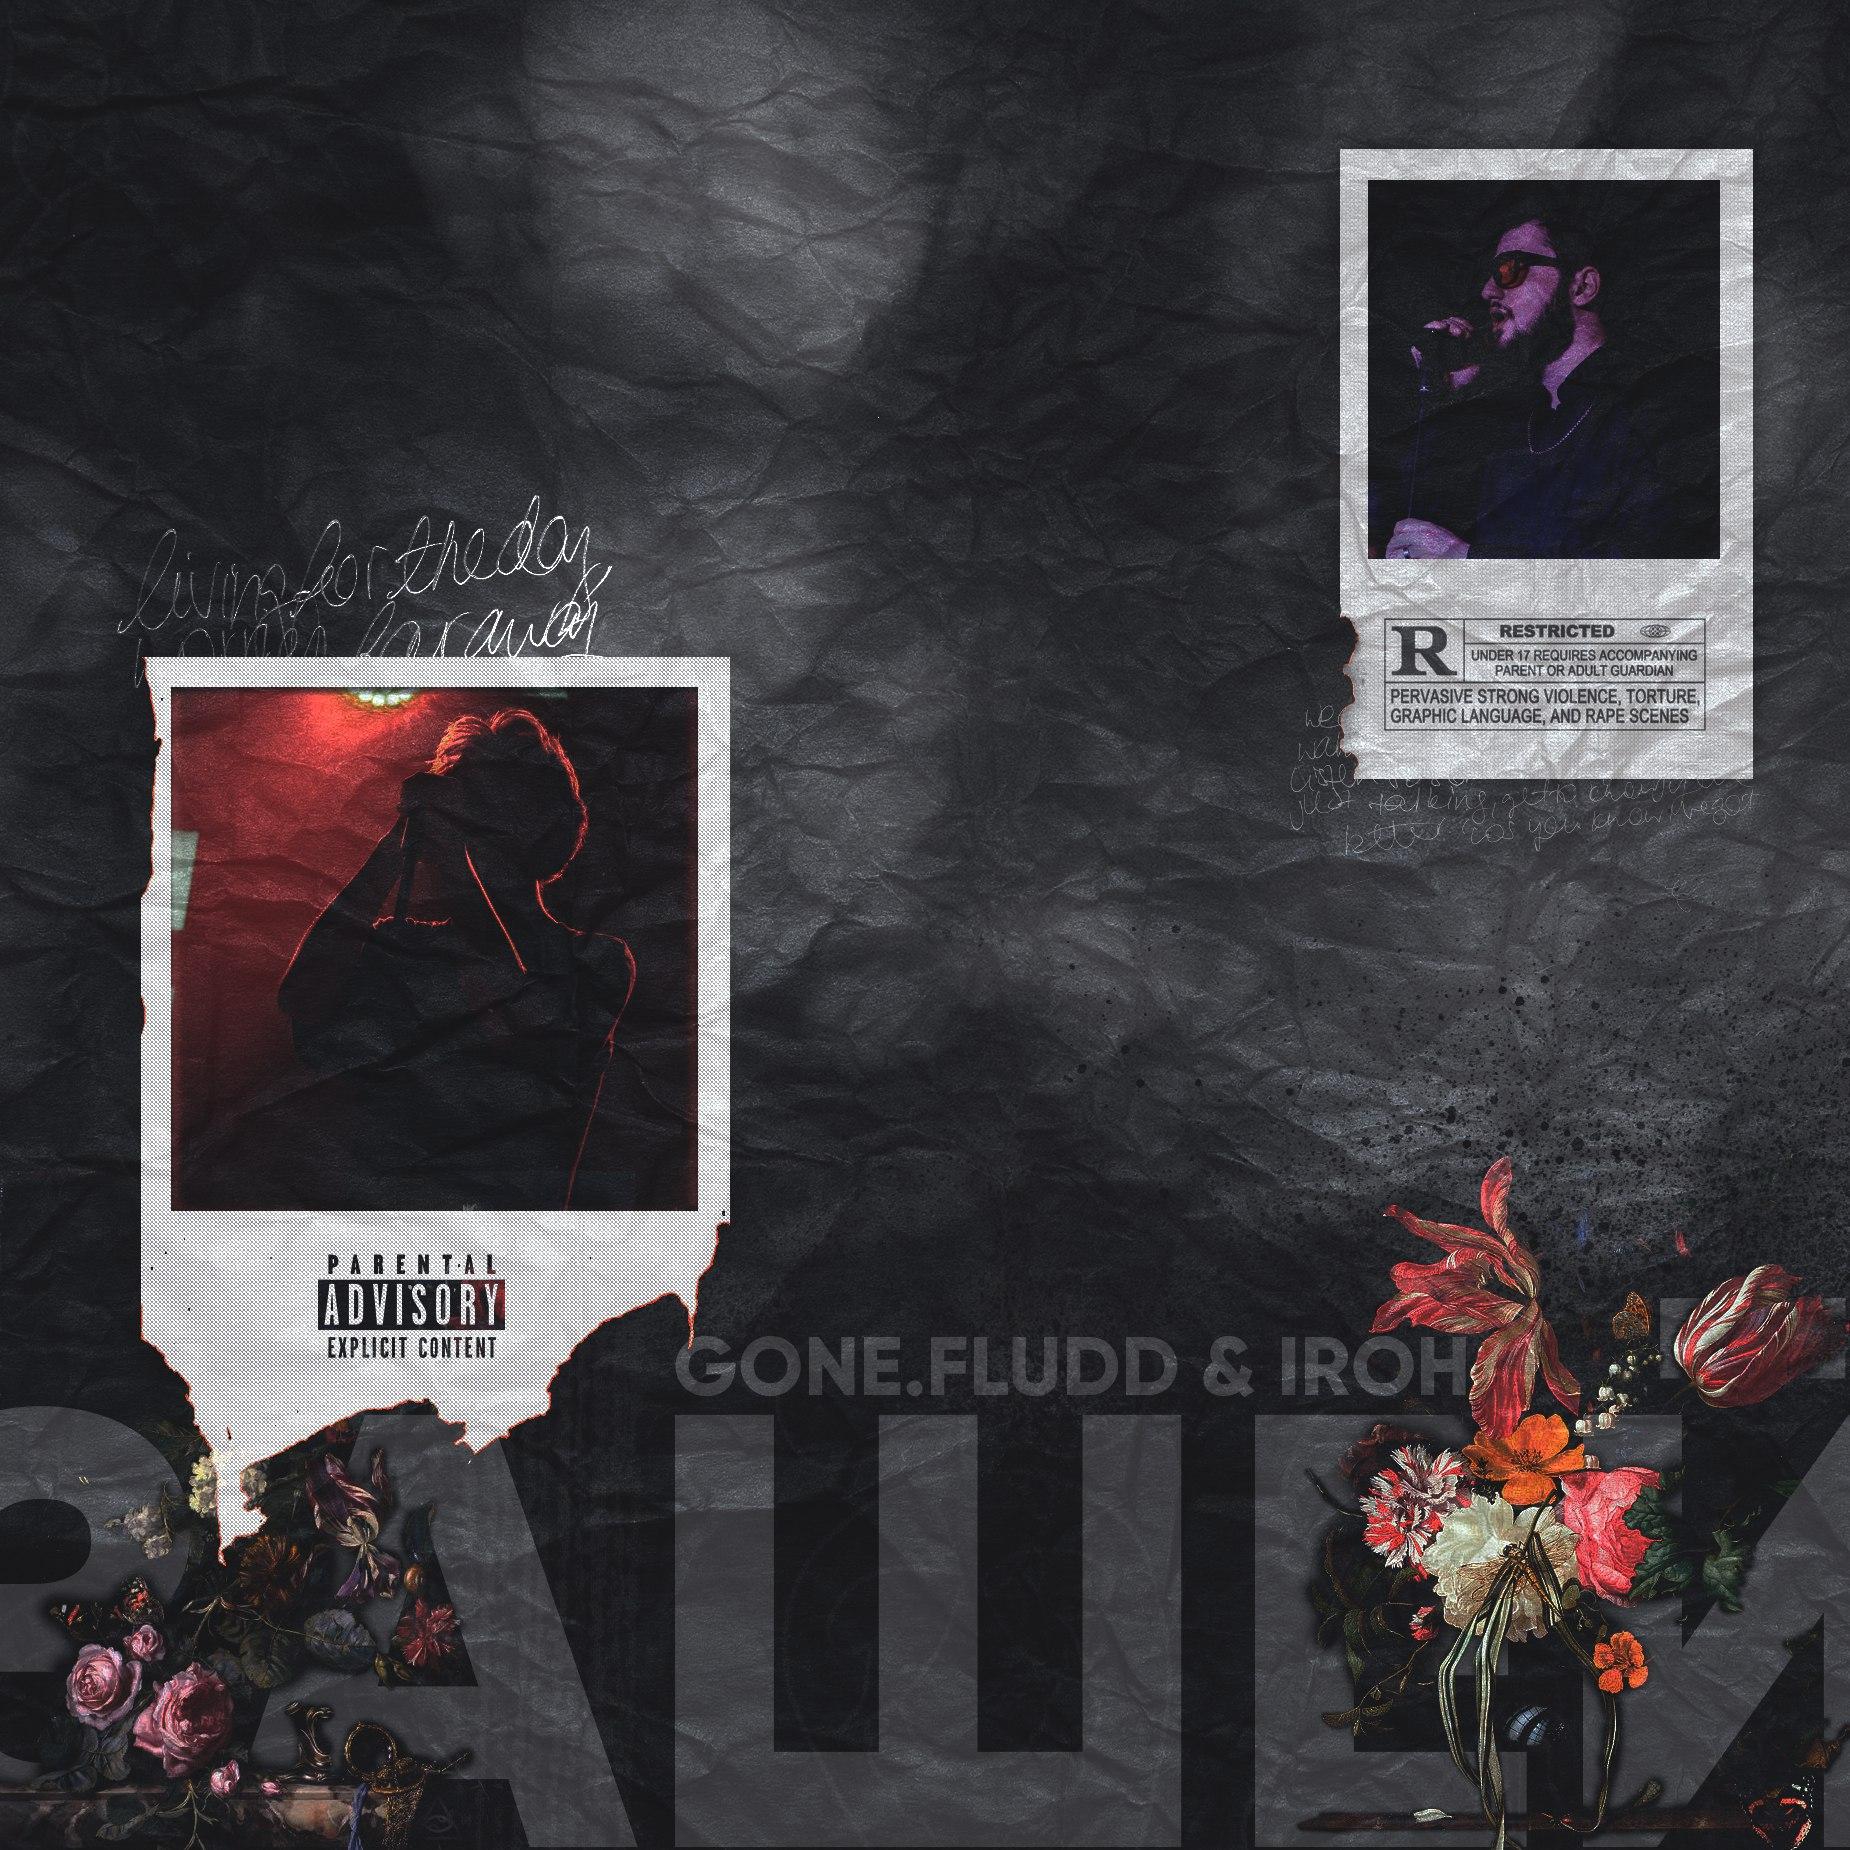 GONE.Fludd & IROH – ЗАШЕЙ